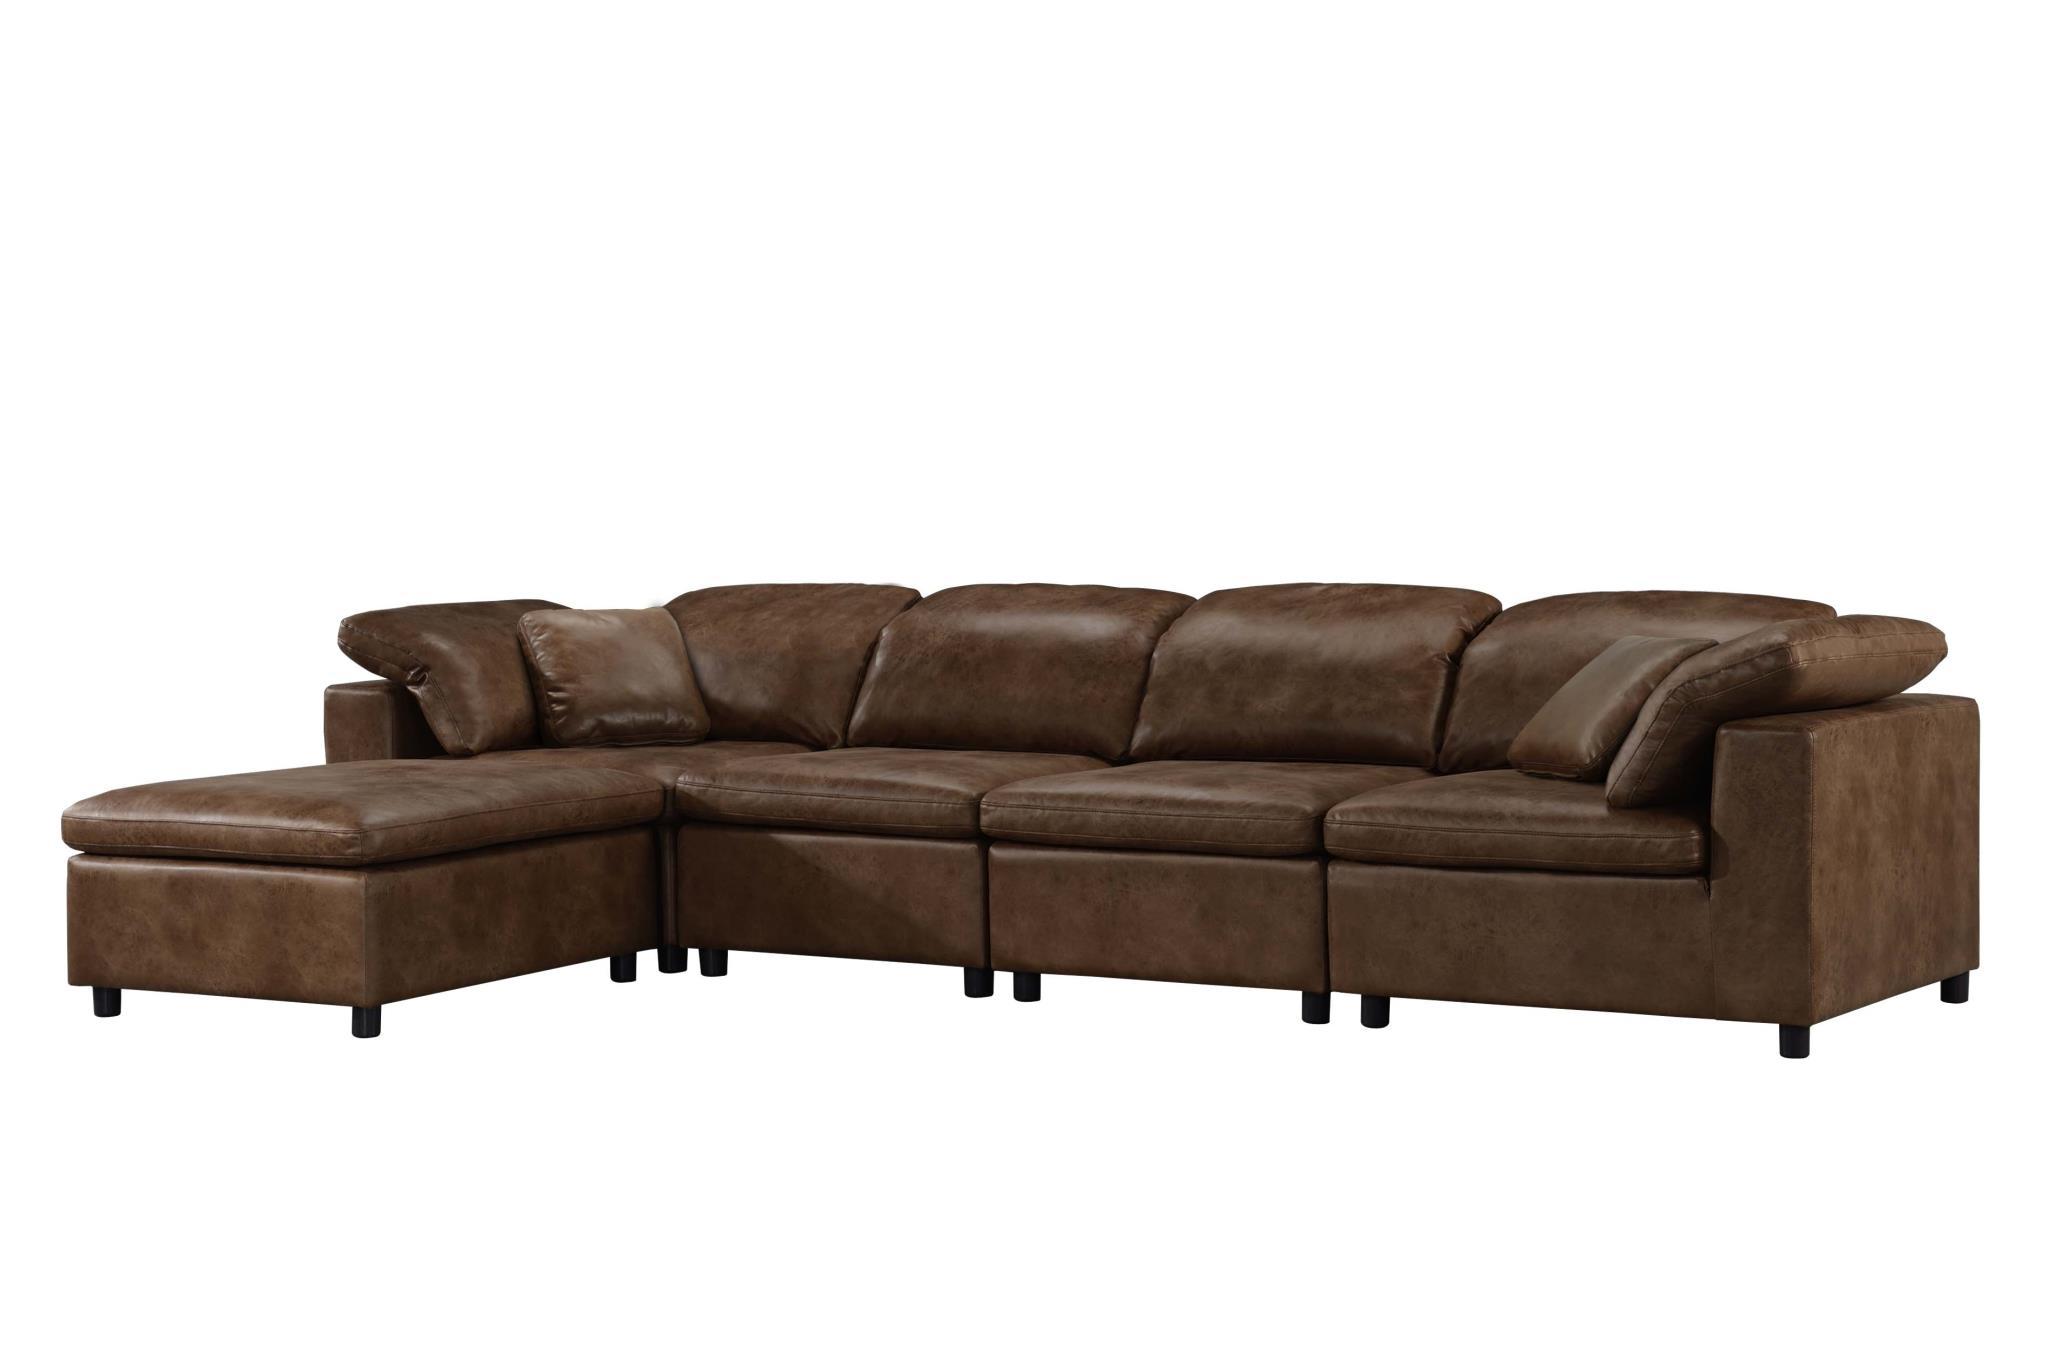 2-Tone Mocha Sectional Sofa Angle